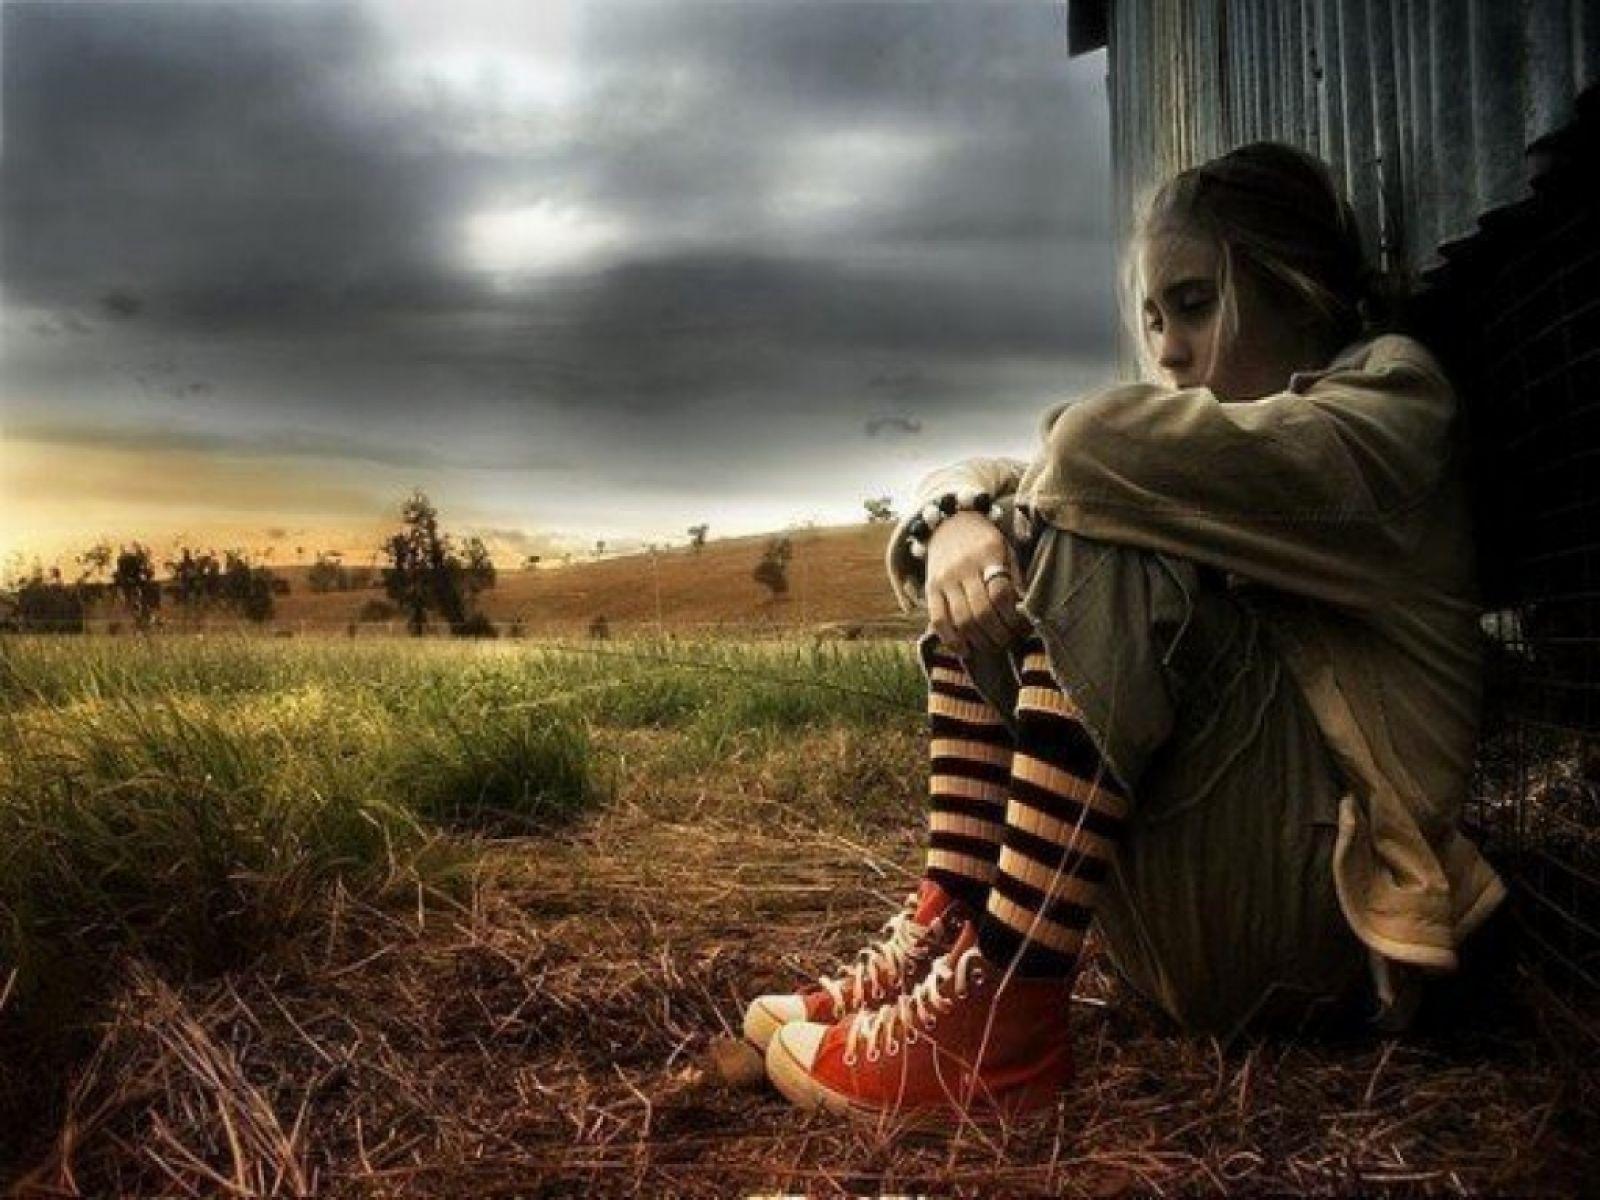 Alone Girl Sad 1600x1200